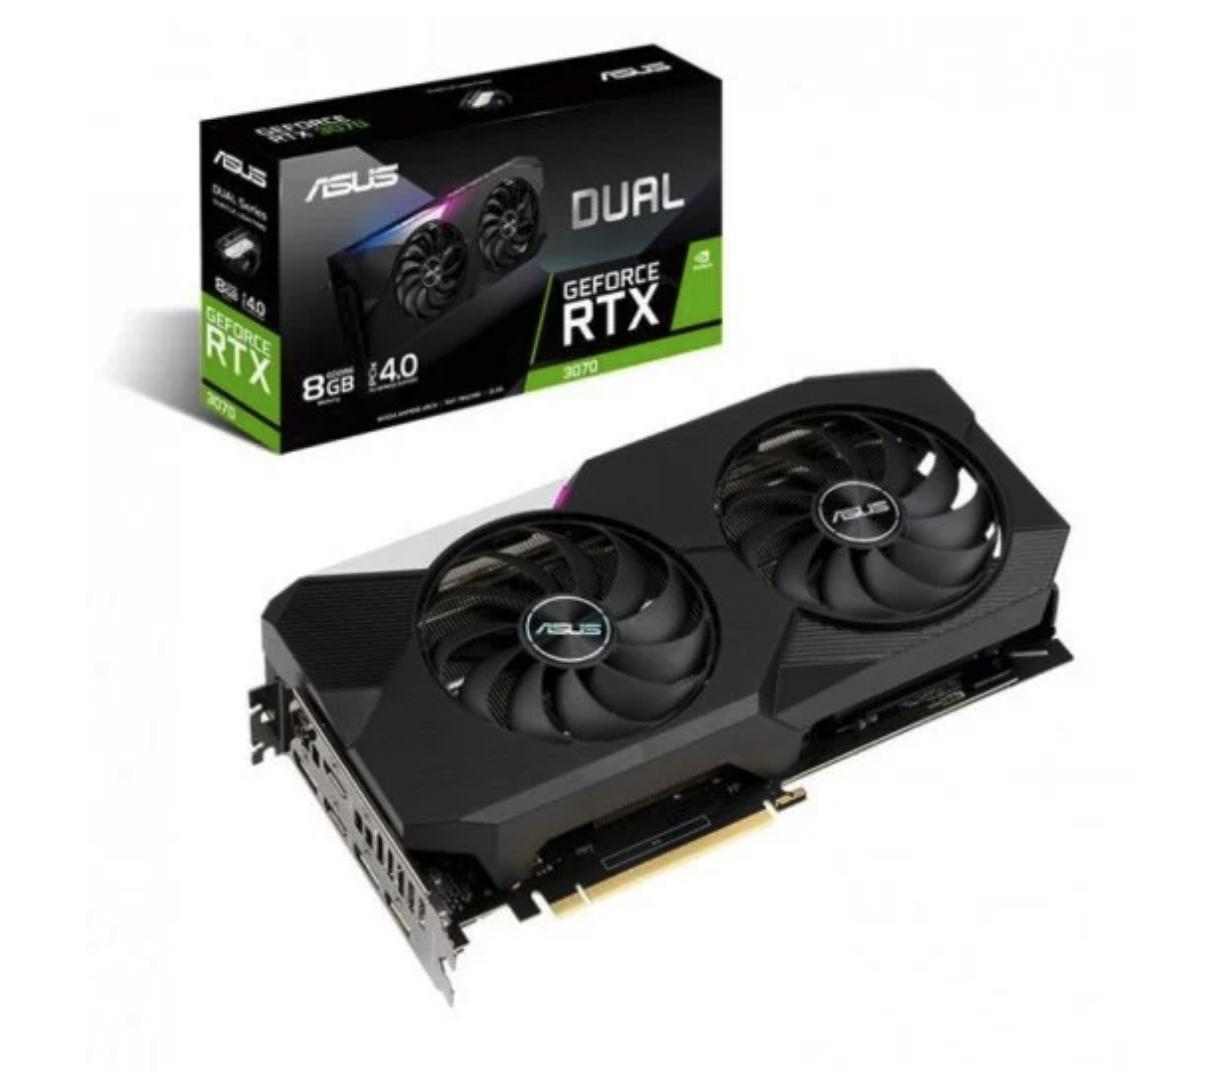 Asus GeForce RTX 3070 Dual 8 GB GDDR6